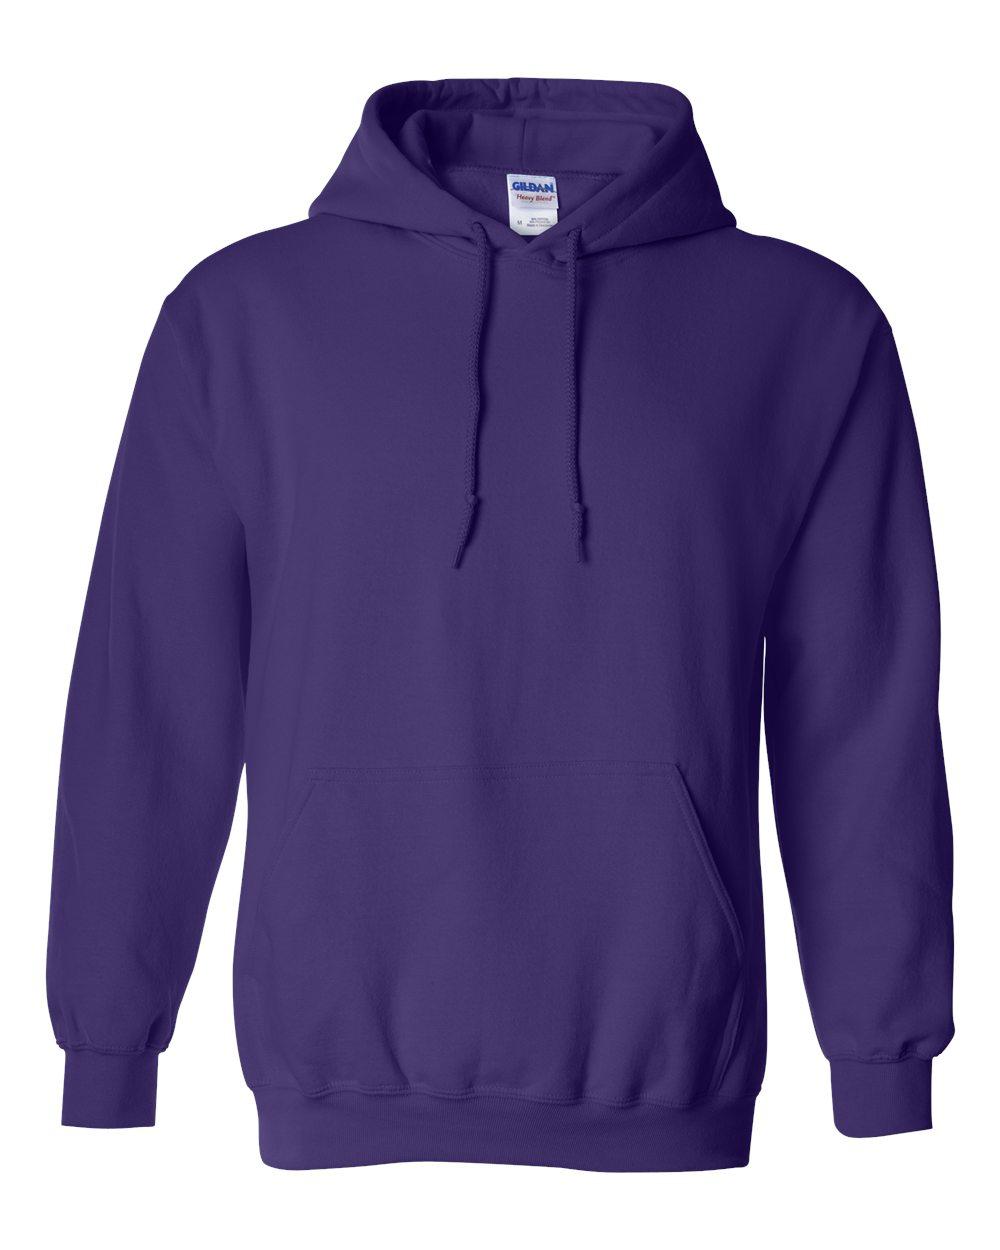 Gildan-Mens-Blank-Hoodie-Heavy-Blend-Hooded-Sweatshirt-Solid-18500-up-to-5XL thumbnail 71